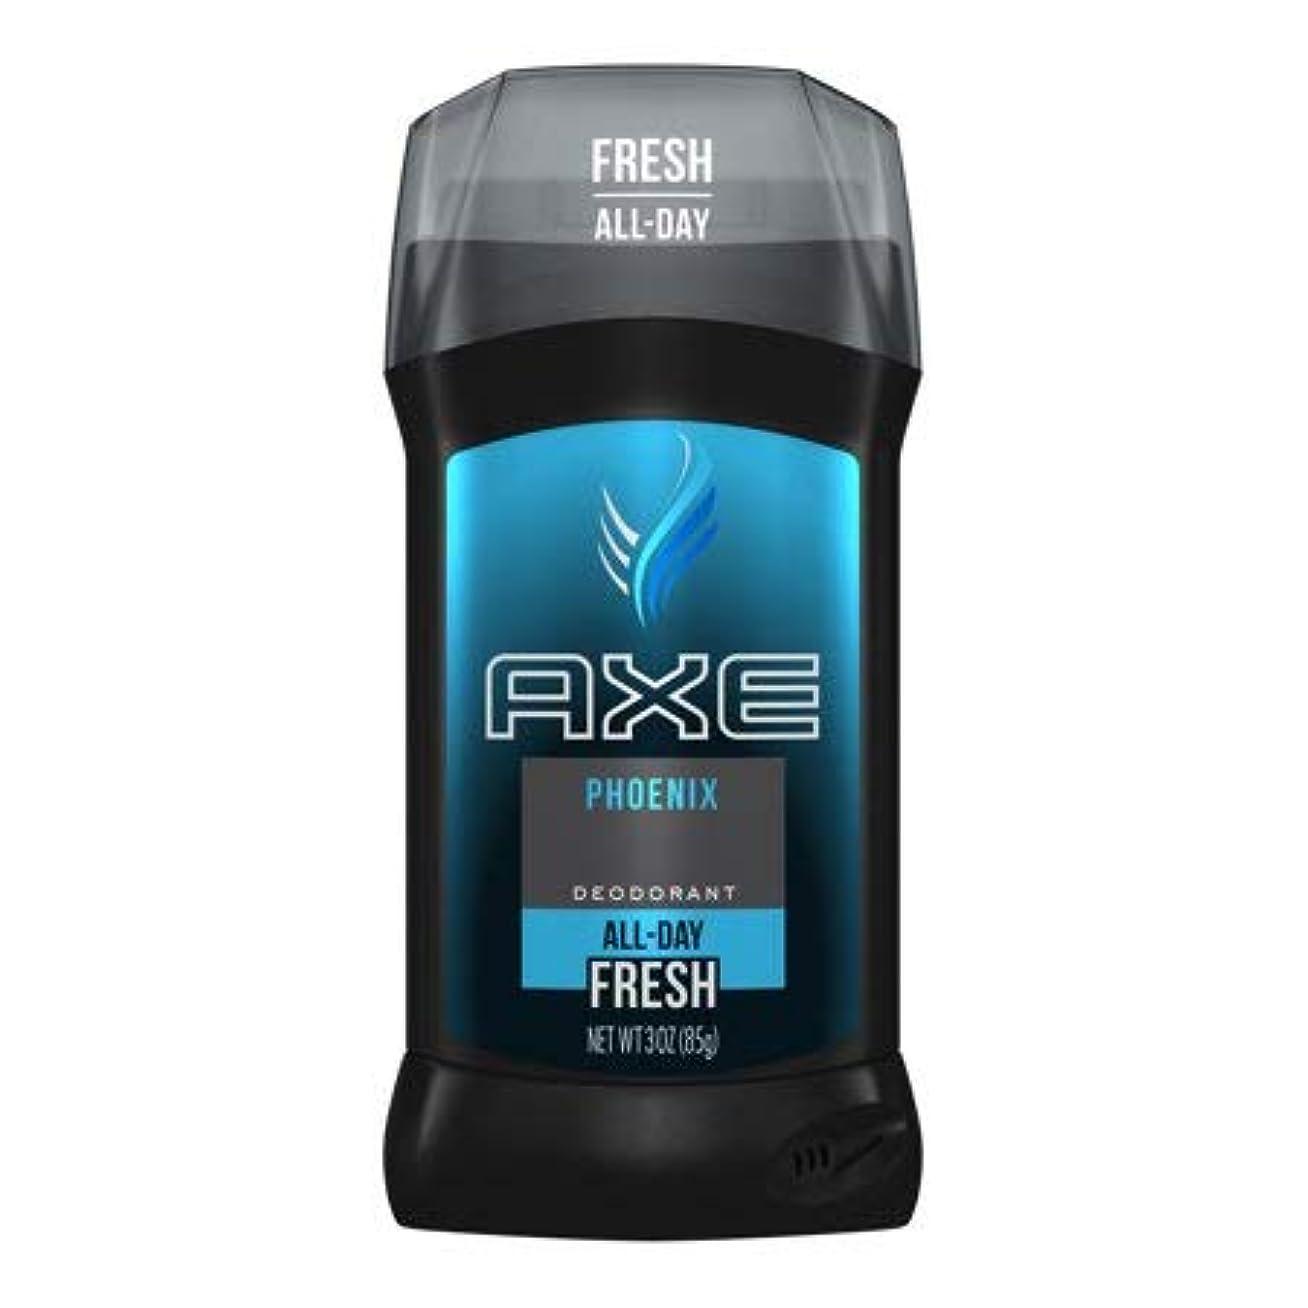 AXE Phoenix Deodorant Stick Fresh 3 oz アクセ フェニックス フレッシュ デオドラント 海外直送品 [並行輸入品]